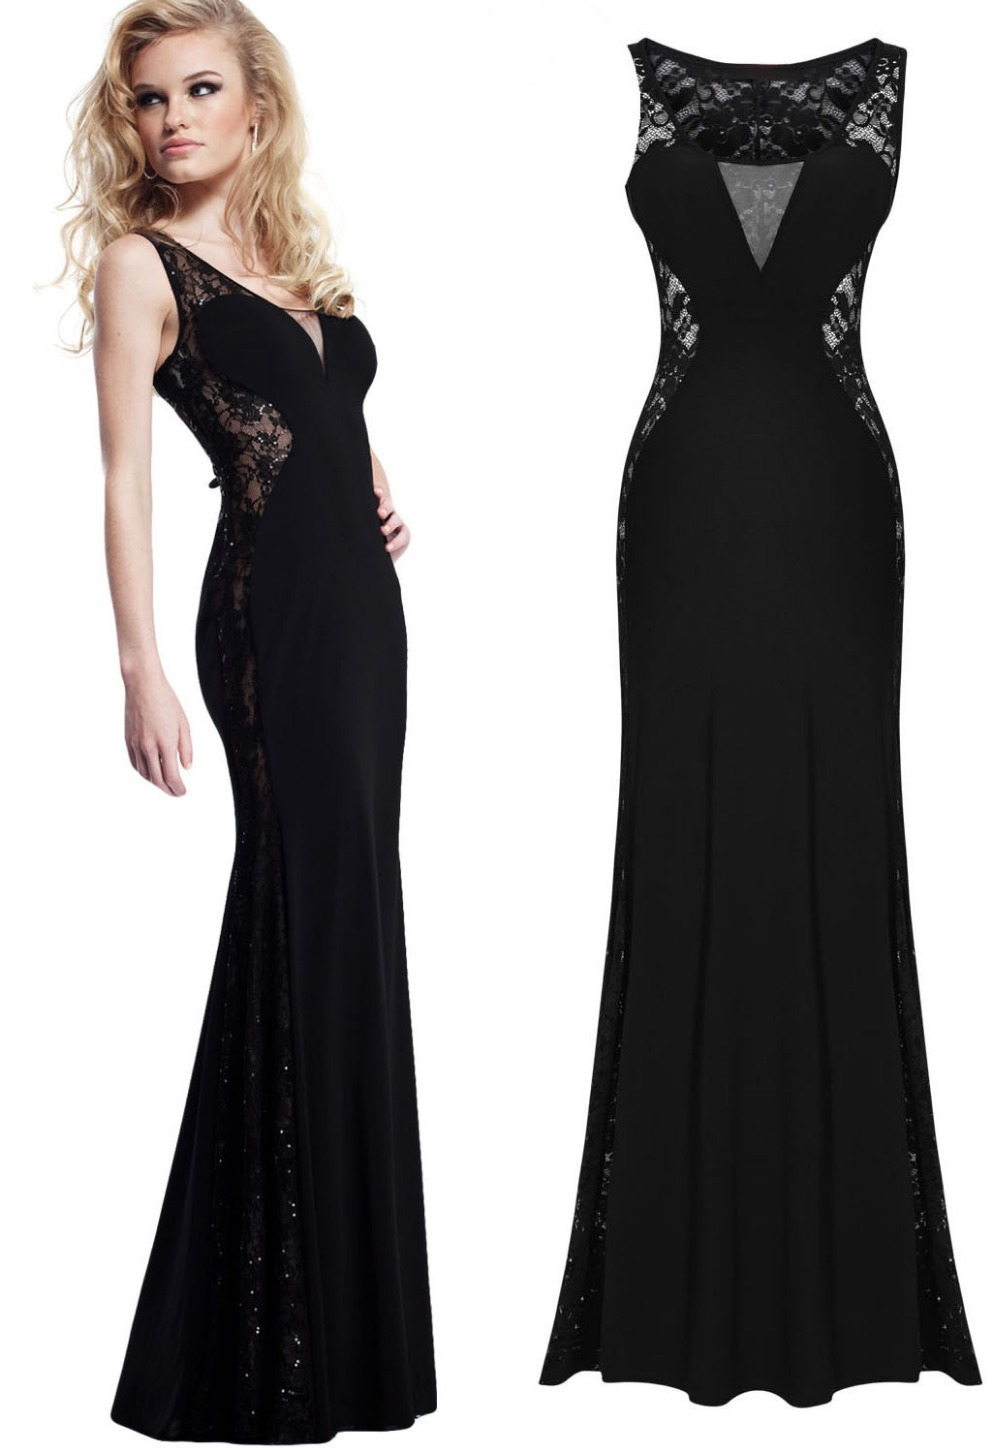 Aliexpress.com : Buy new 2014 fashion Summer dress Sexy V neck ...